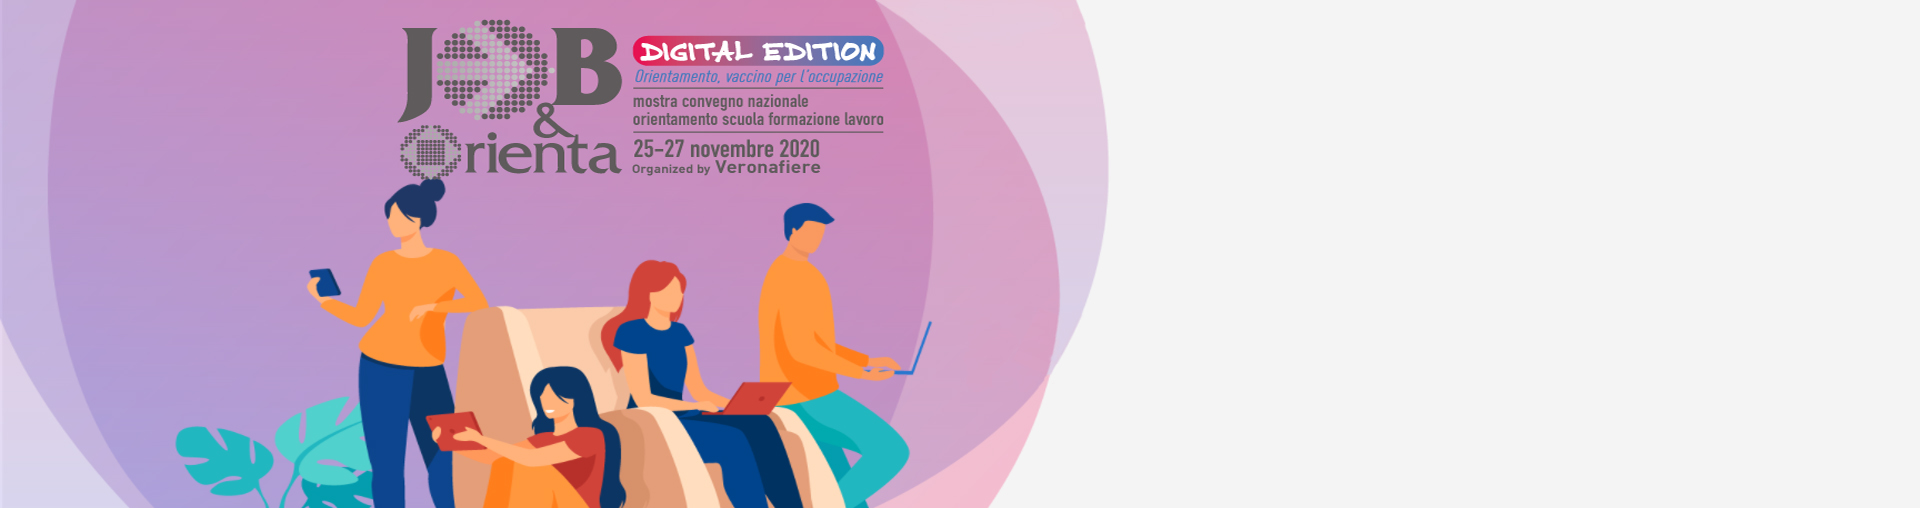 JoB&Orienta Digital Edition